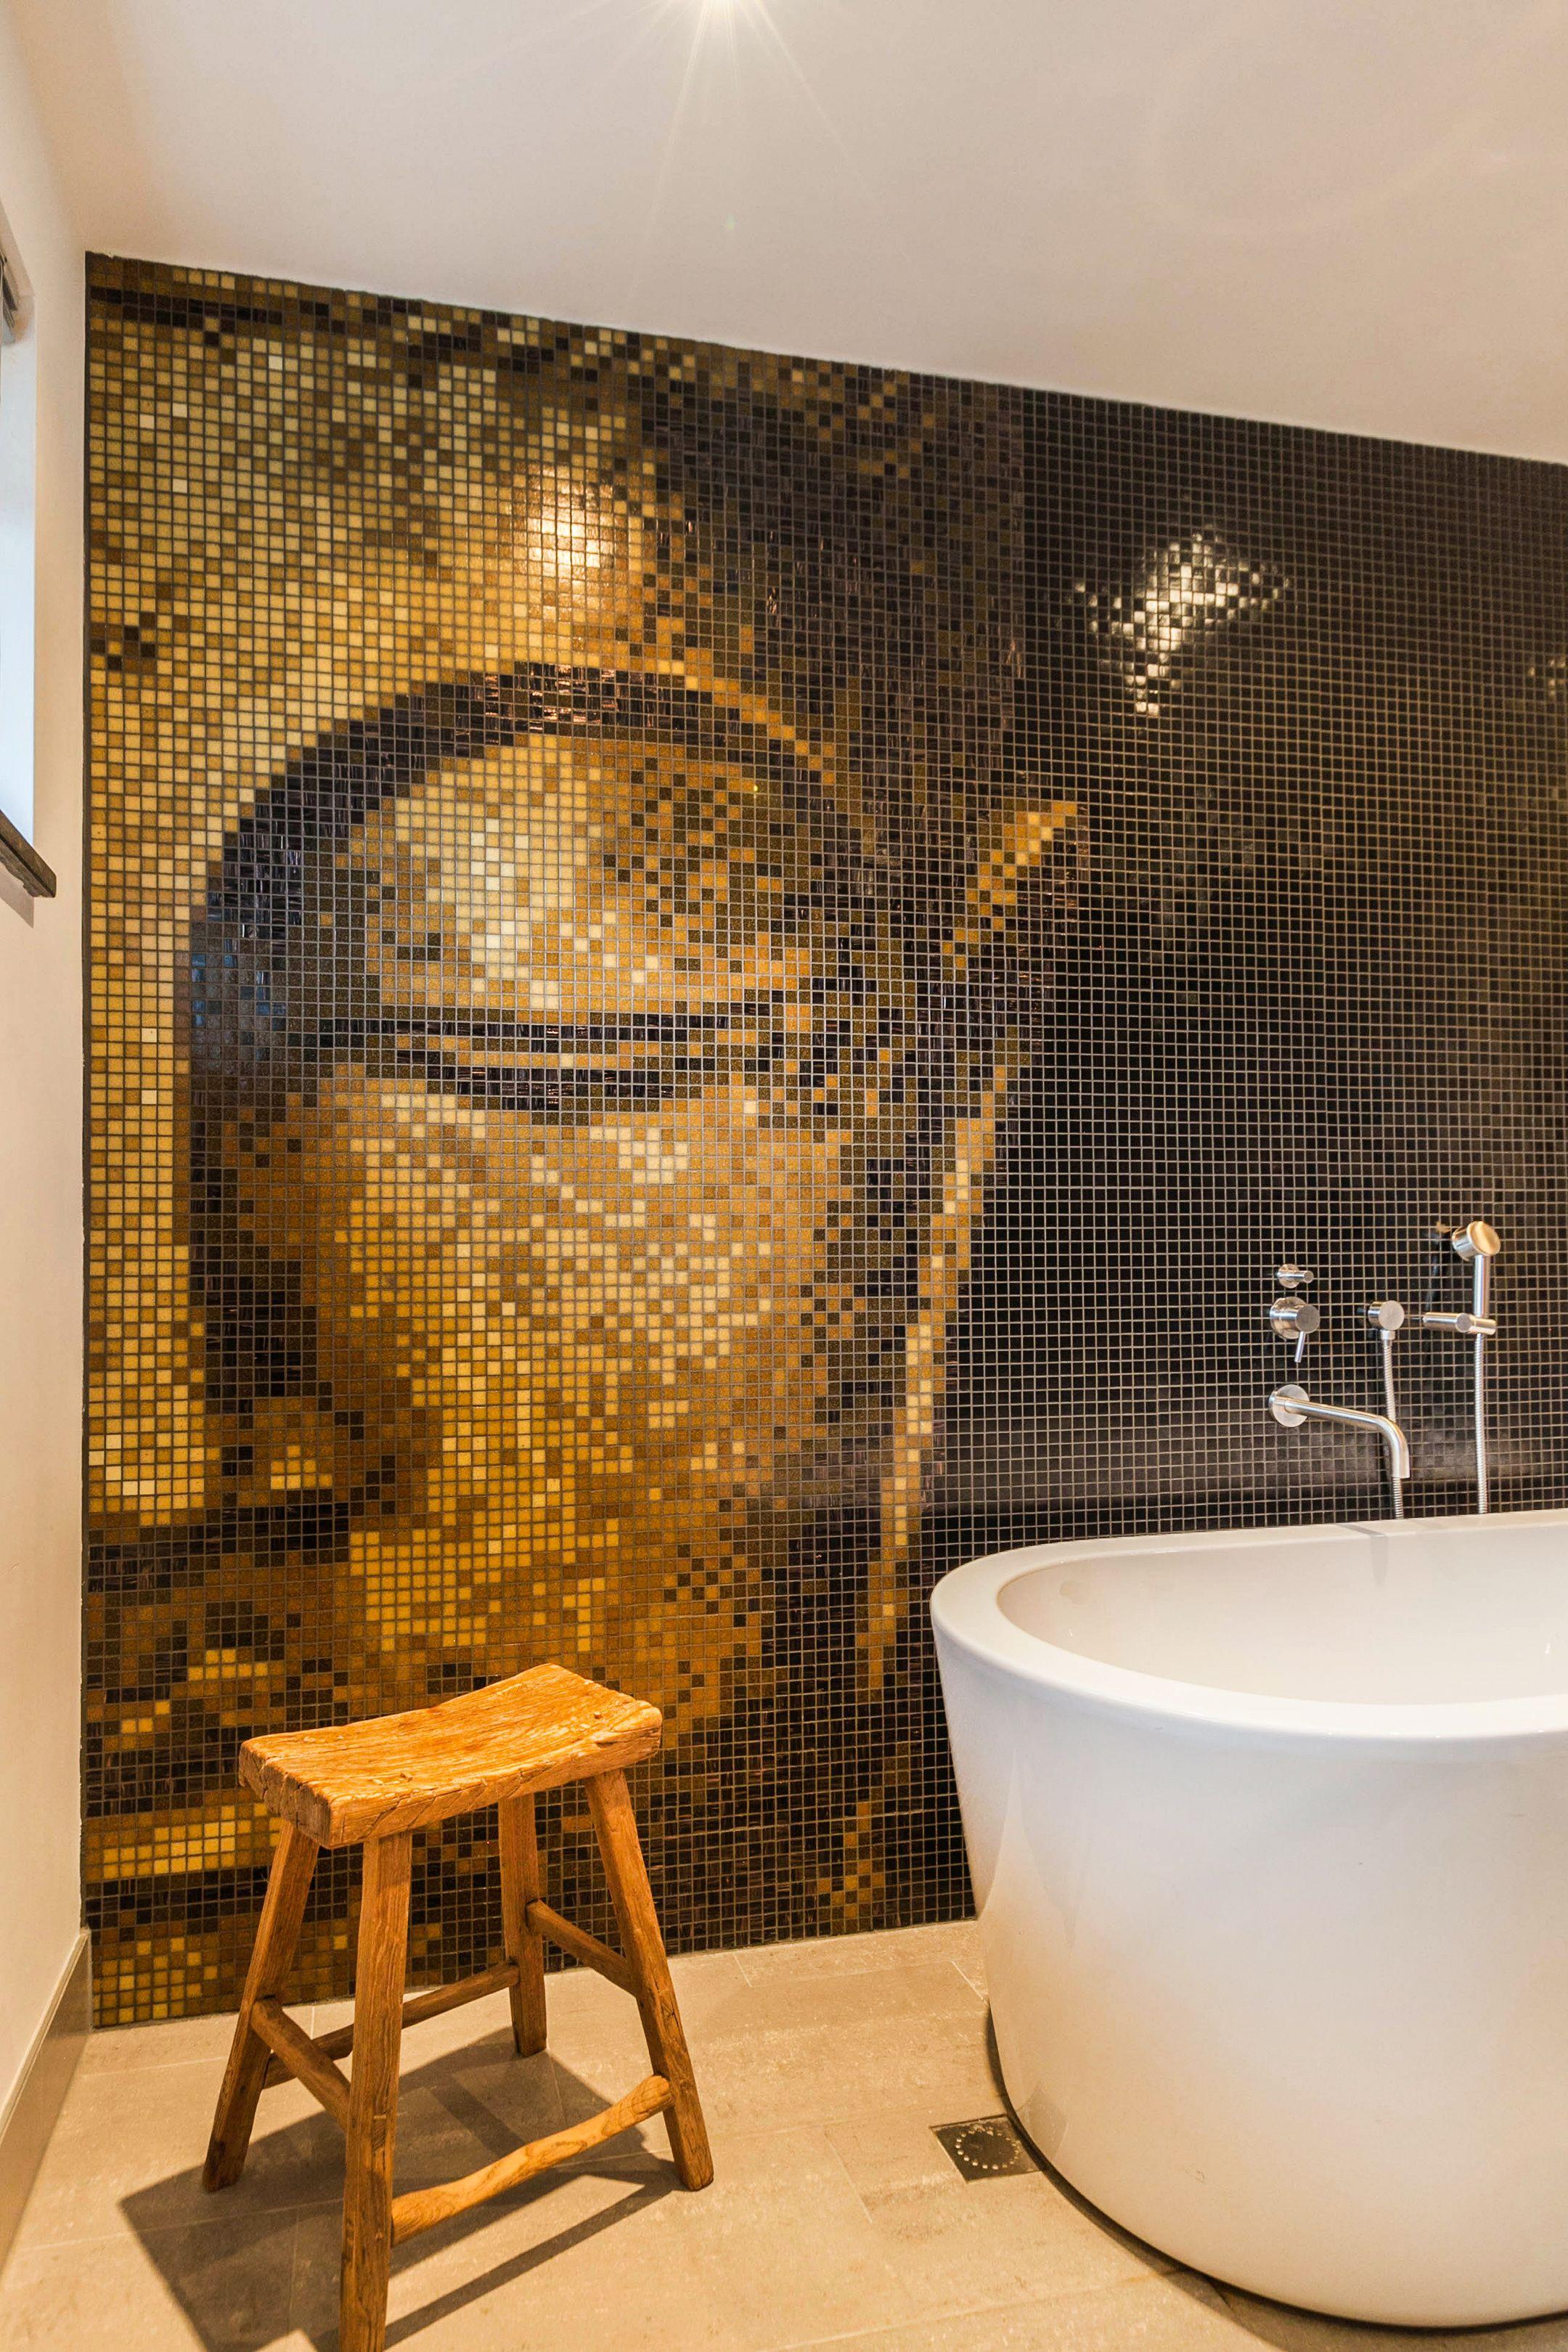 Amazing Wall Bath Bathtub Ensuite Bathroom Buddha Realestatephotography Ambience Decoration Amazing Realtor Interi Fotografie Badkamerideeen Foto S